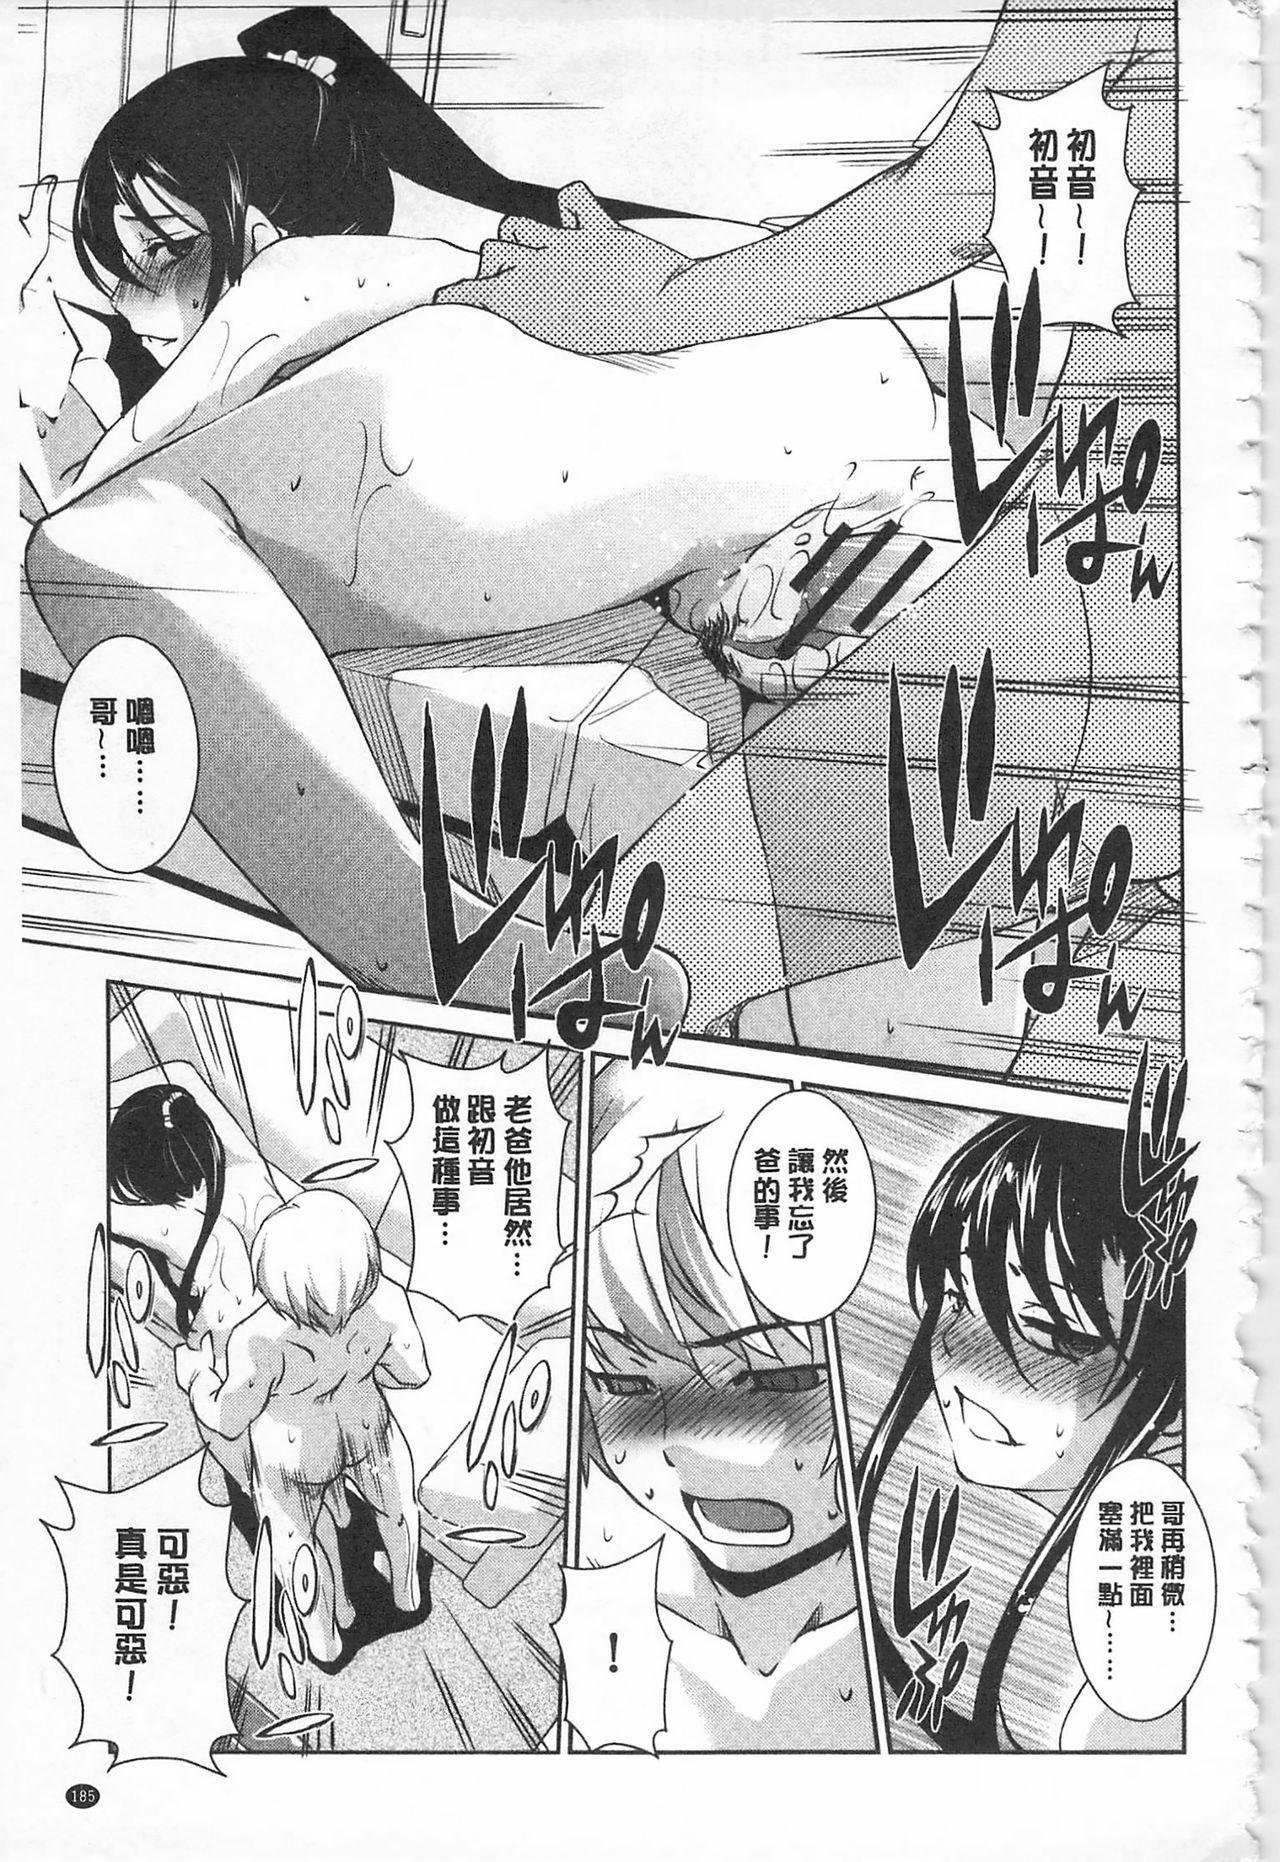 [Amano Kazumi] Seida Inyou -Seijo no Katachi Shita Intou- | 聖墮陰陽 -聖女的容貌與淫蕩- [Chinese] 188